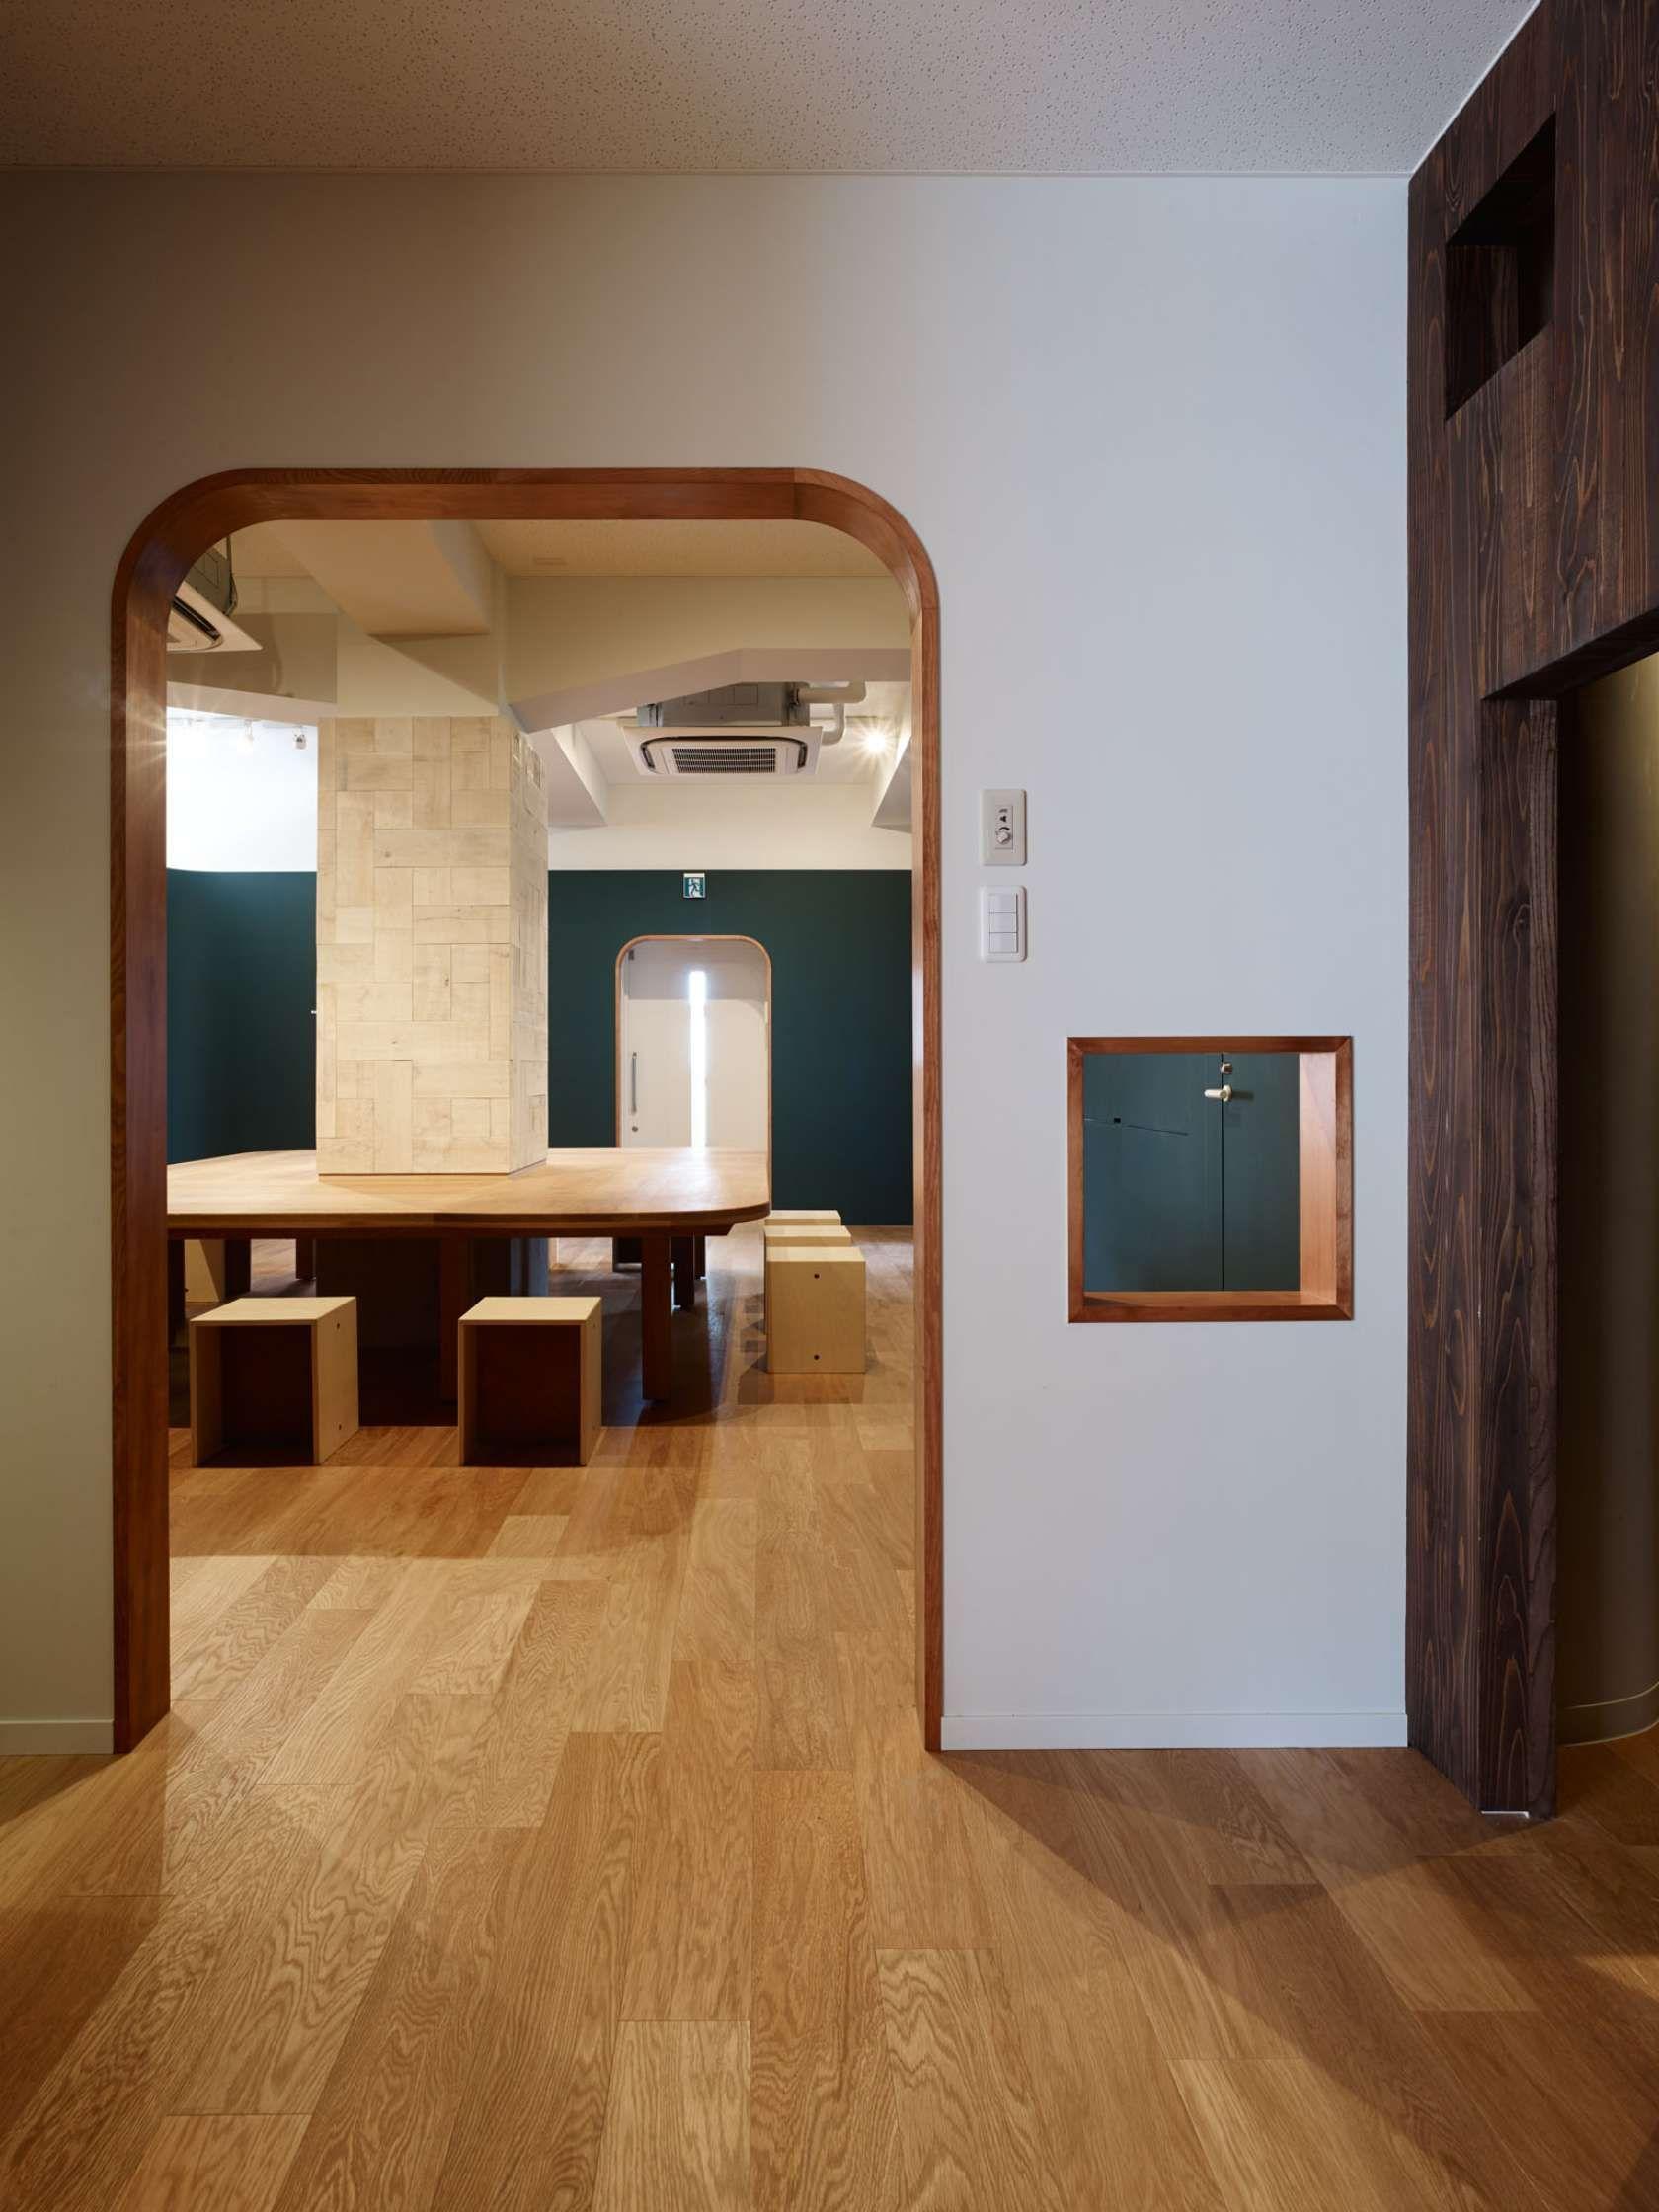 Gallery Of Kindergarten Mavrica Breda Bizjak Bb Arhitekti  # Muebles Doo Beograd